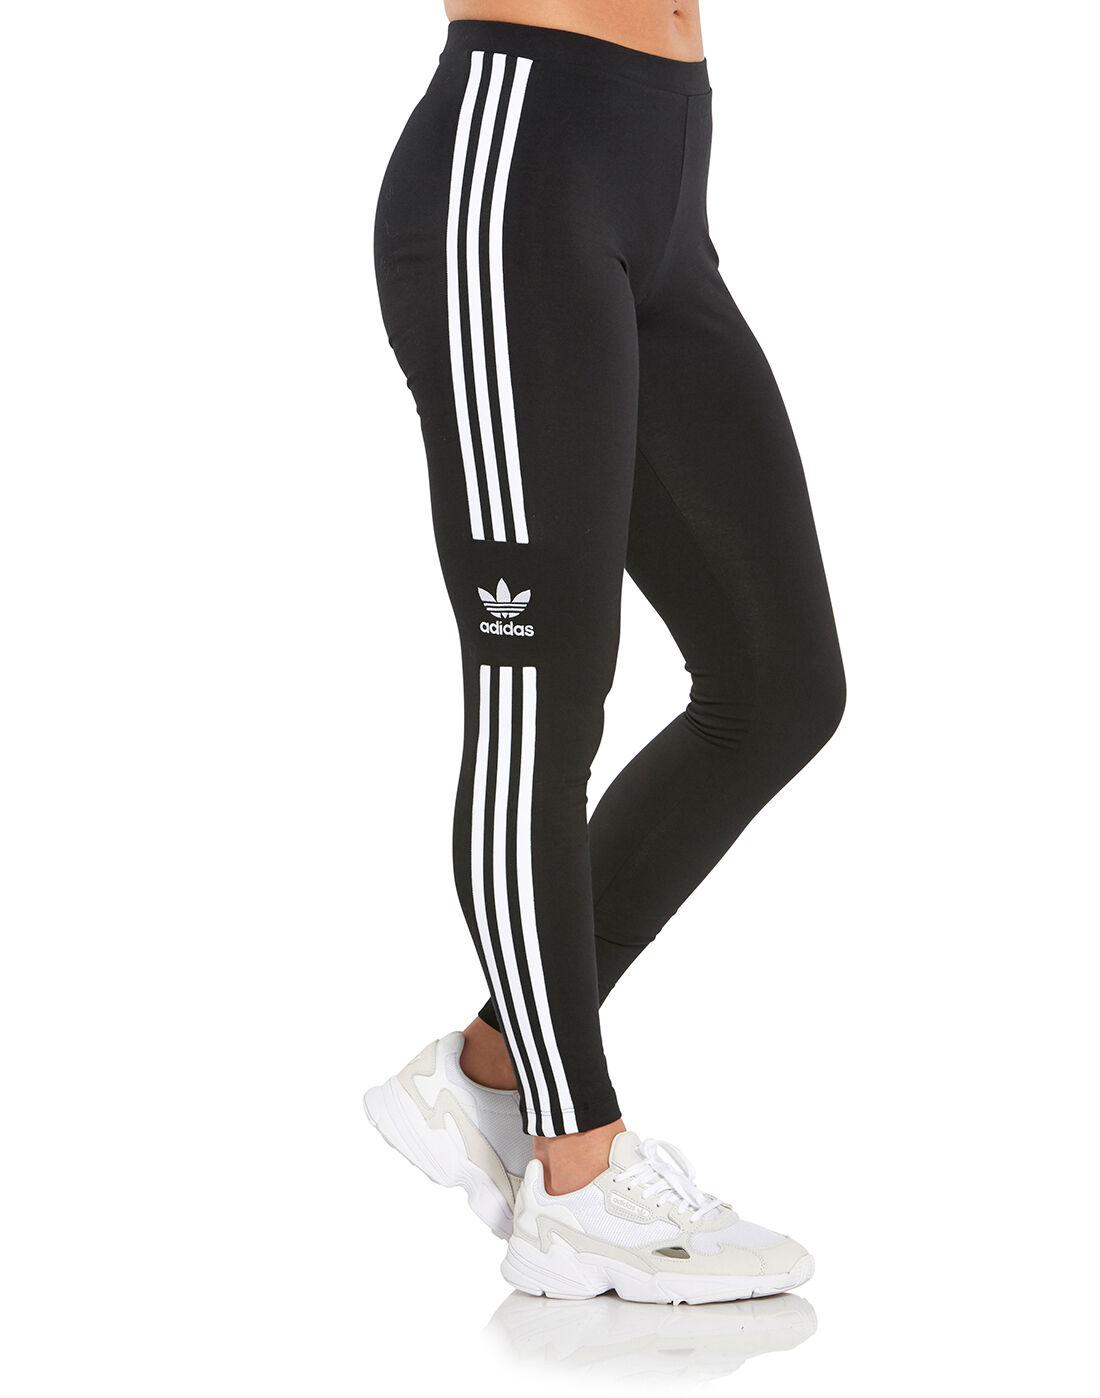 Leggings | Women's adidas & Nike Leggings | Life Style Sports